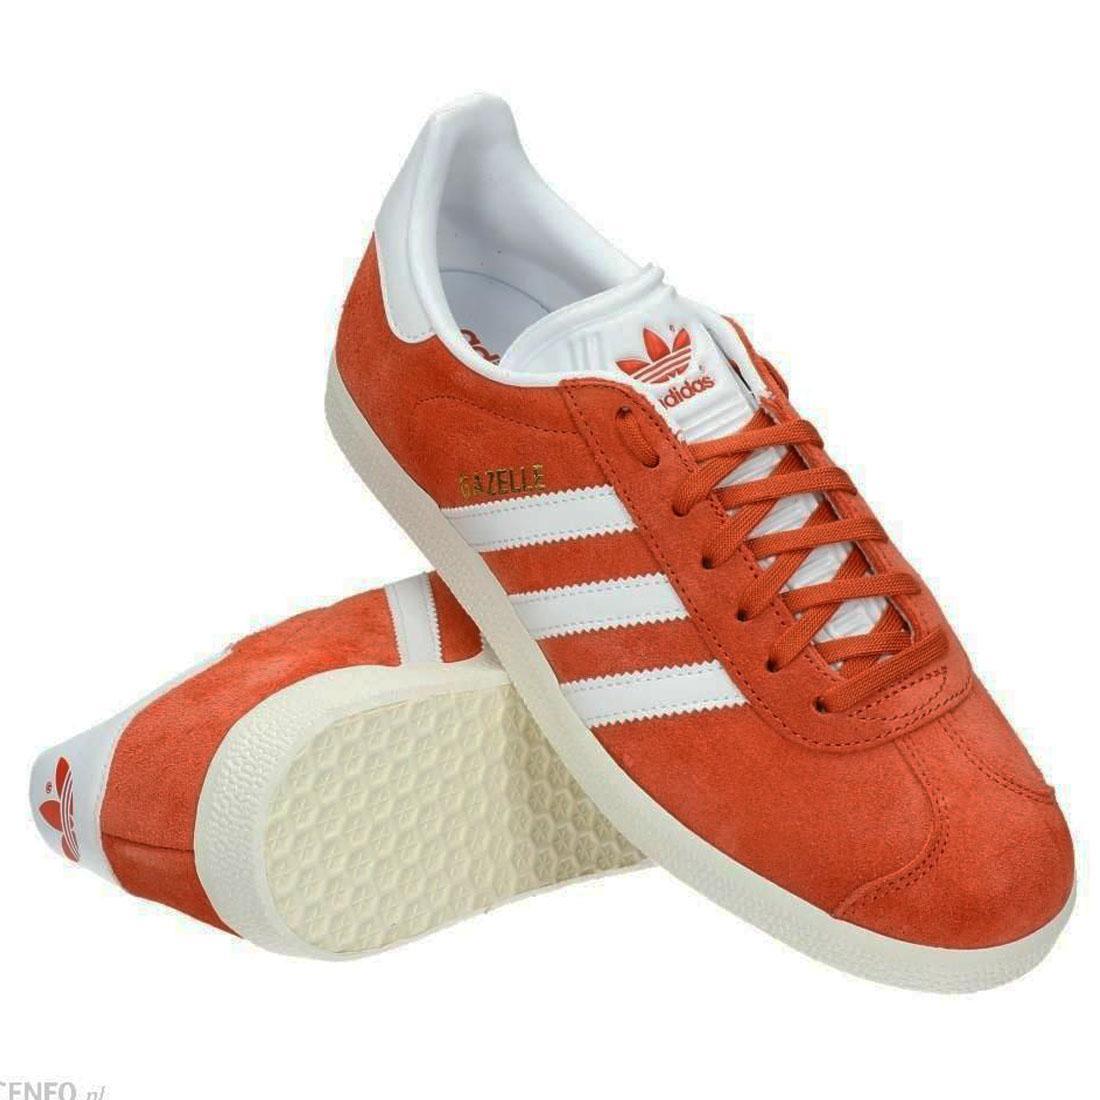 best service e1806 f4e30 adidas originals Gazelle Trainers Orange White Mens Shoes BZ0024